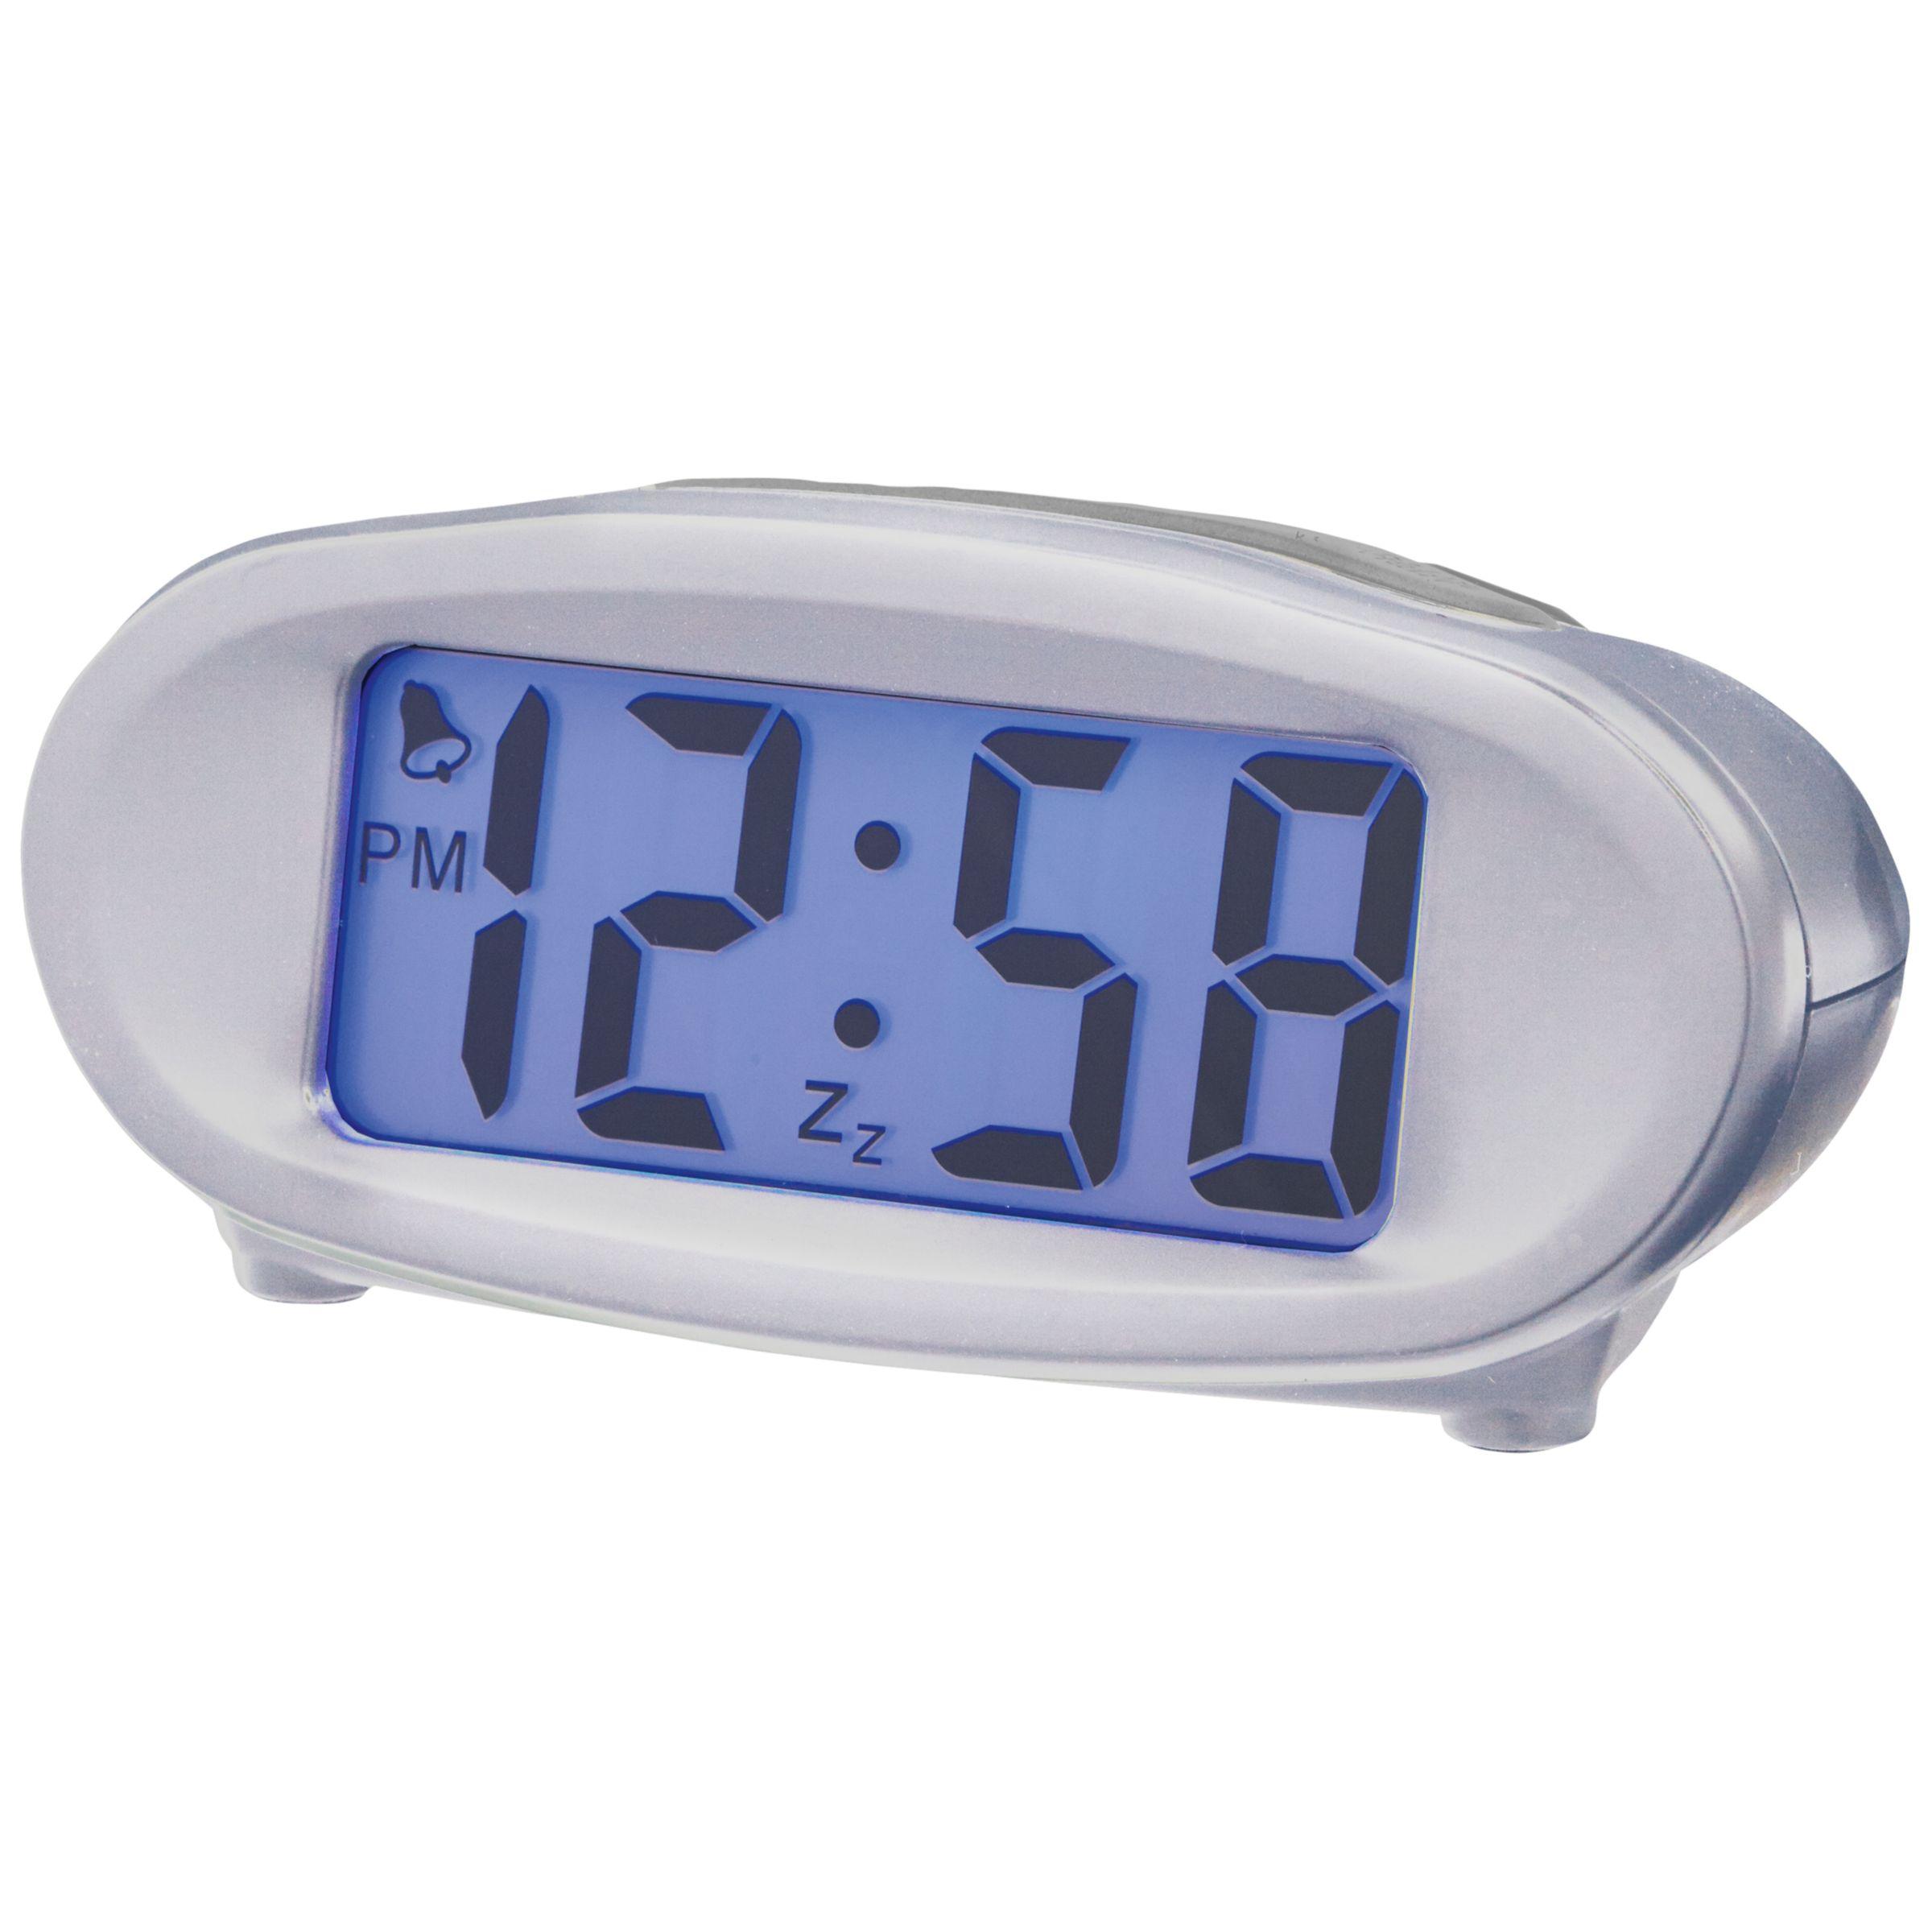 Acctim Acctim Eclipse Solar Dual Power Smartlite® Alarm Clock, Silver